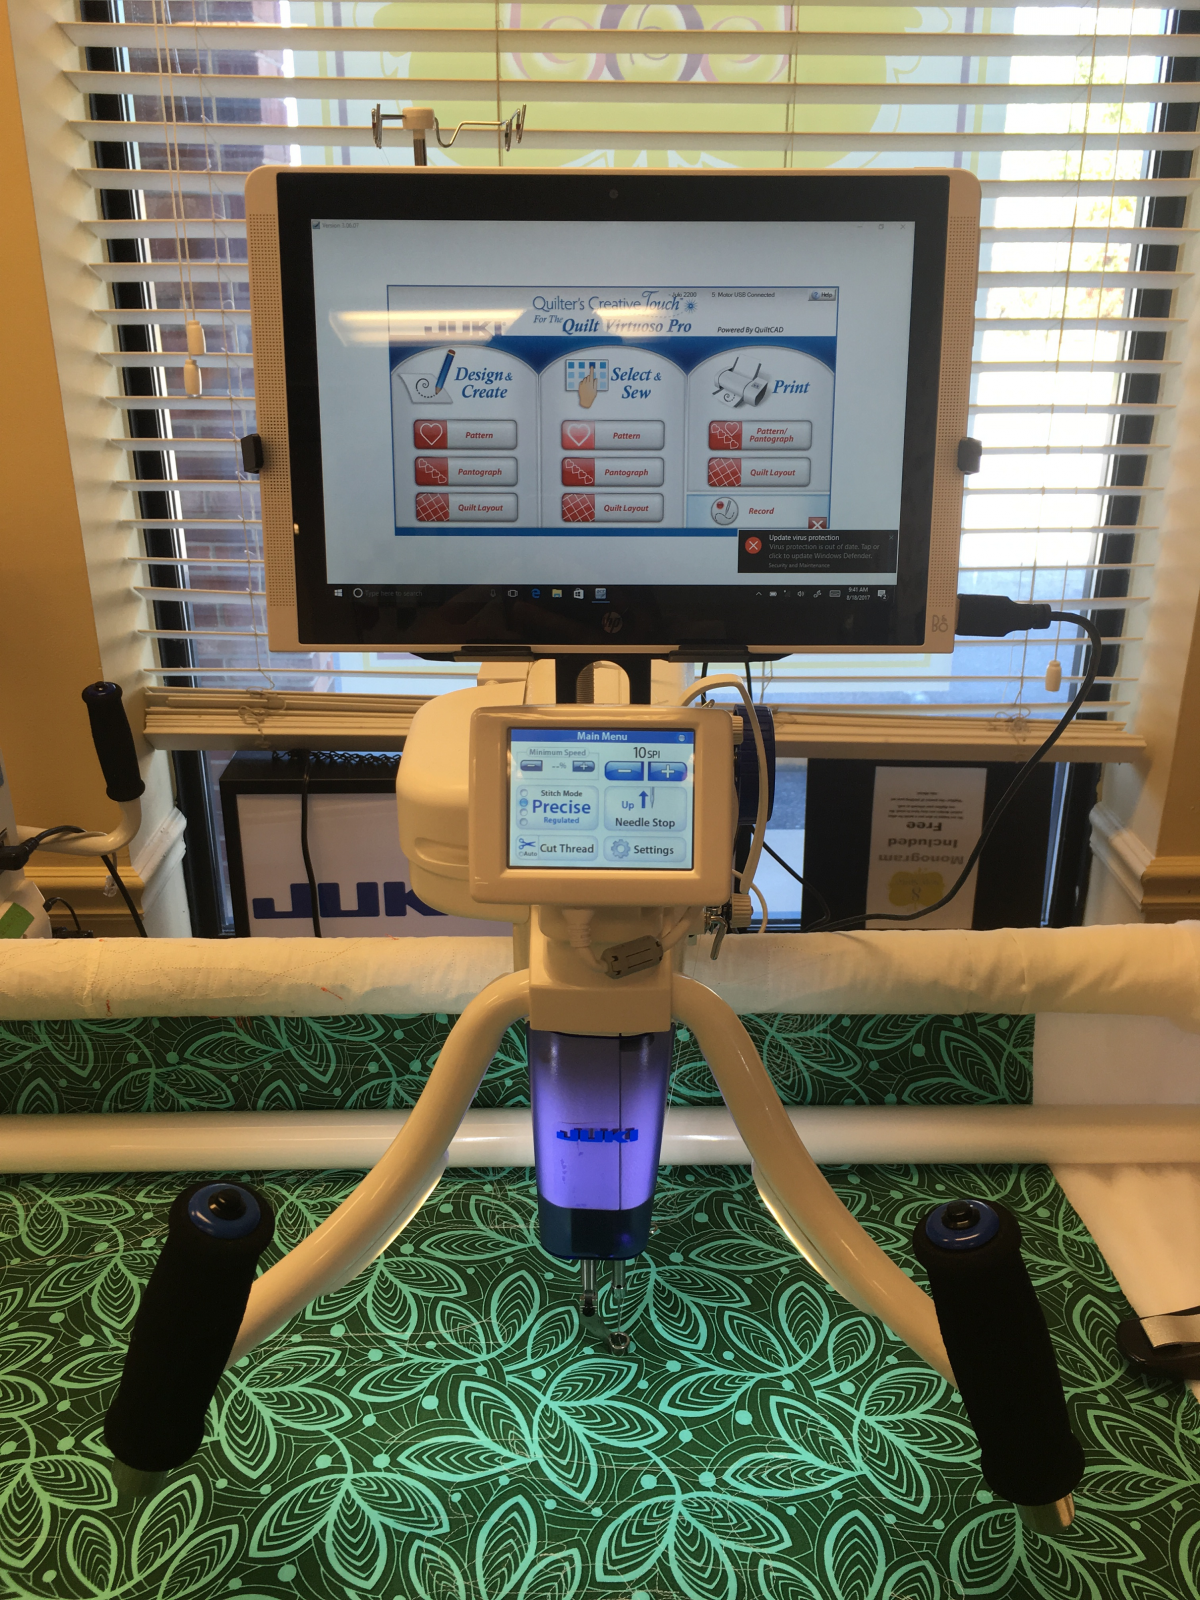 Quilter's Creative Software + Robotics - Juki